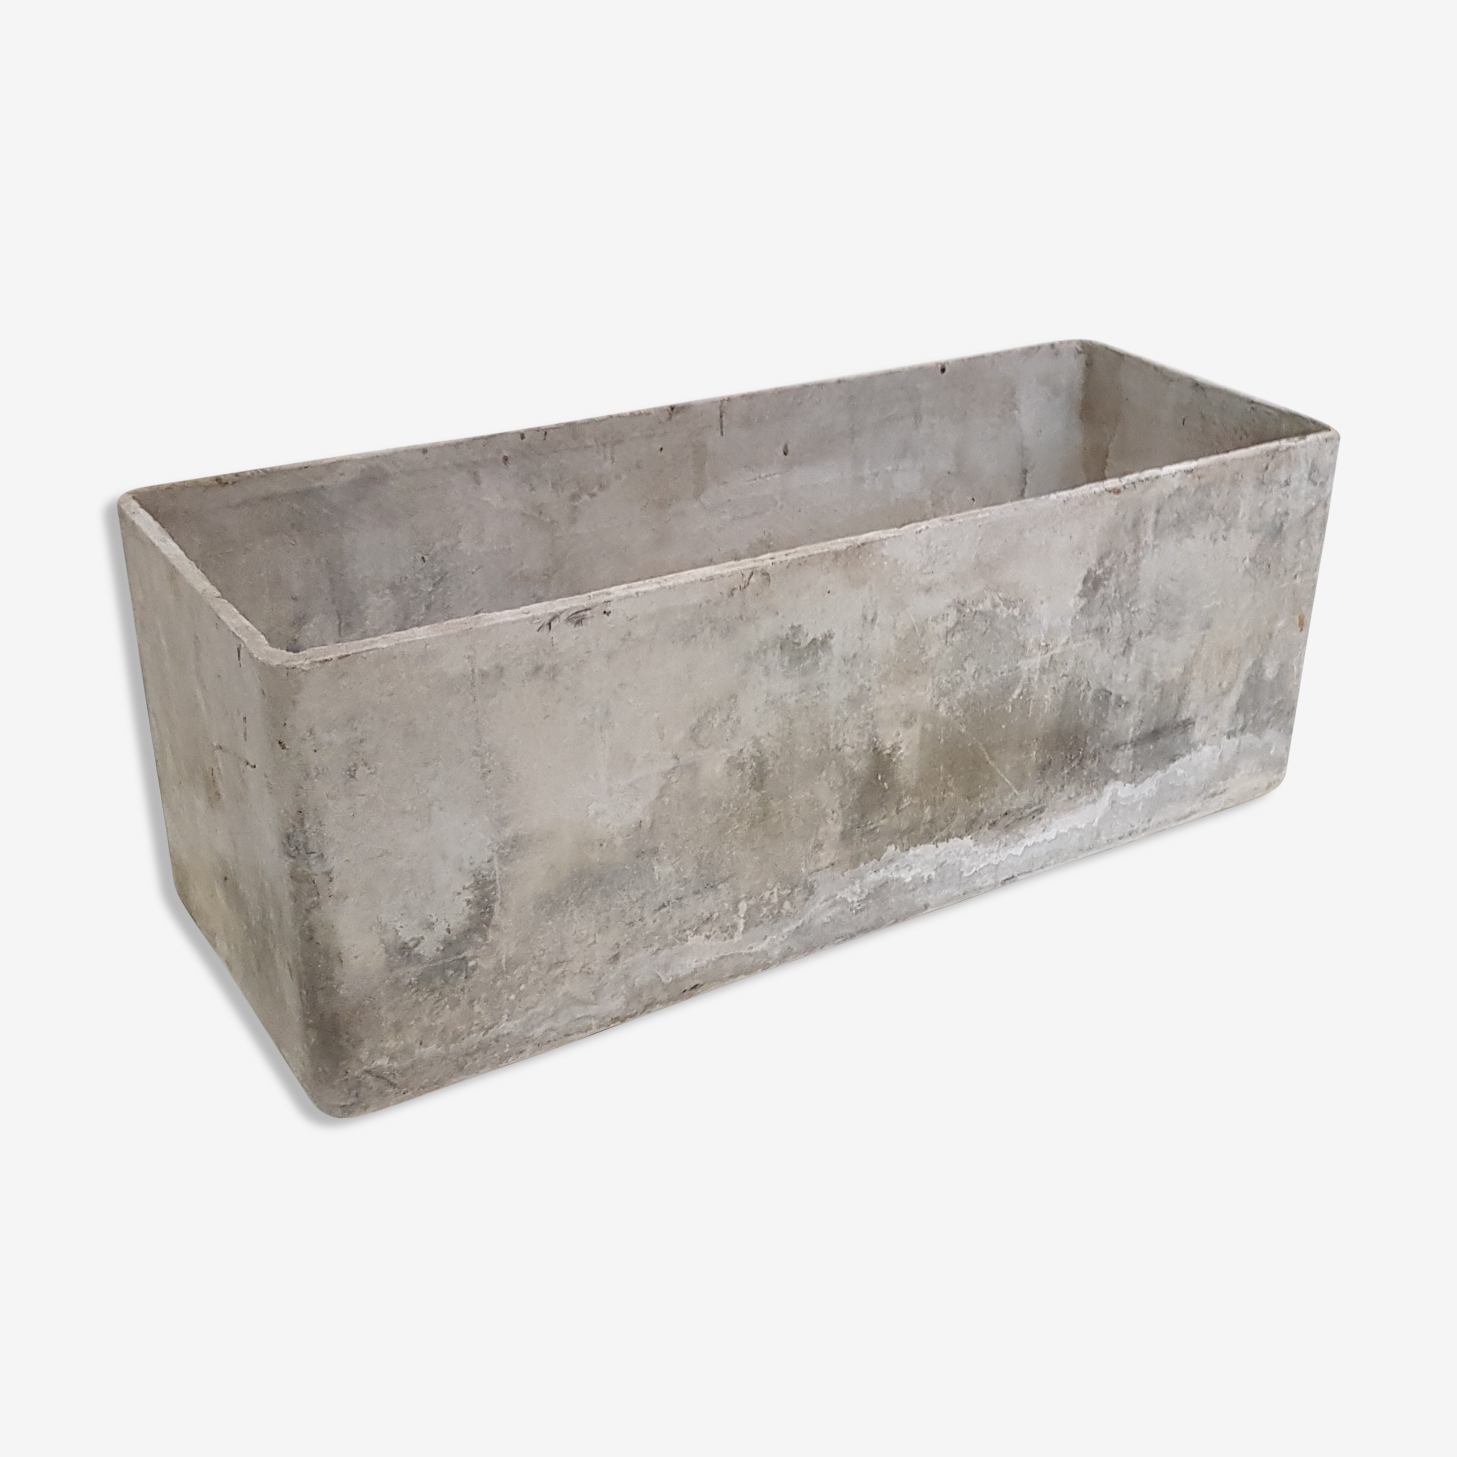 Jardinière or cache pot rectangular